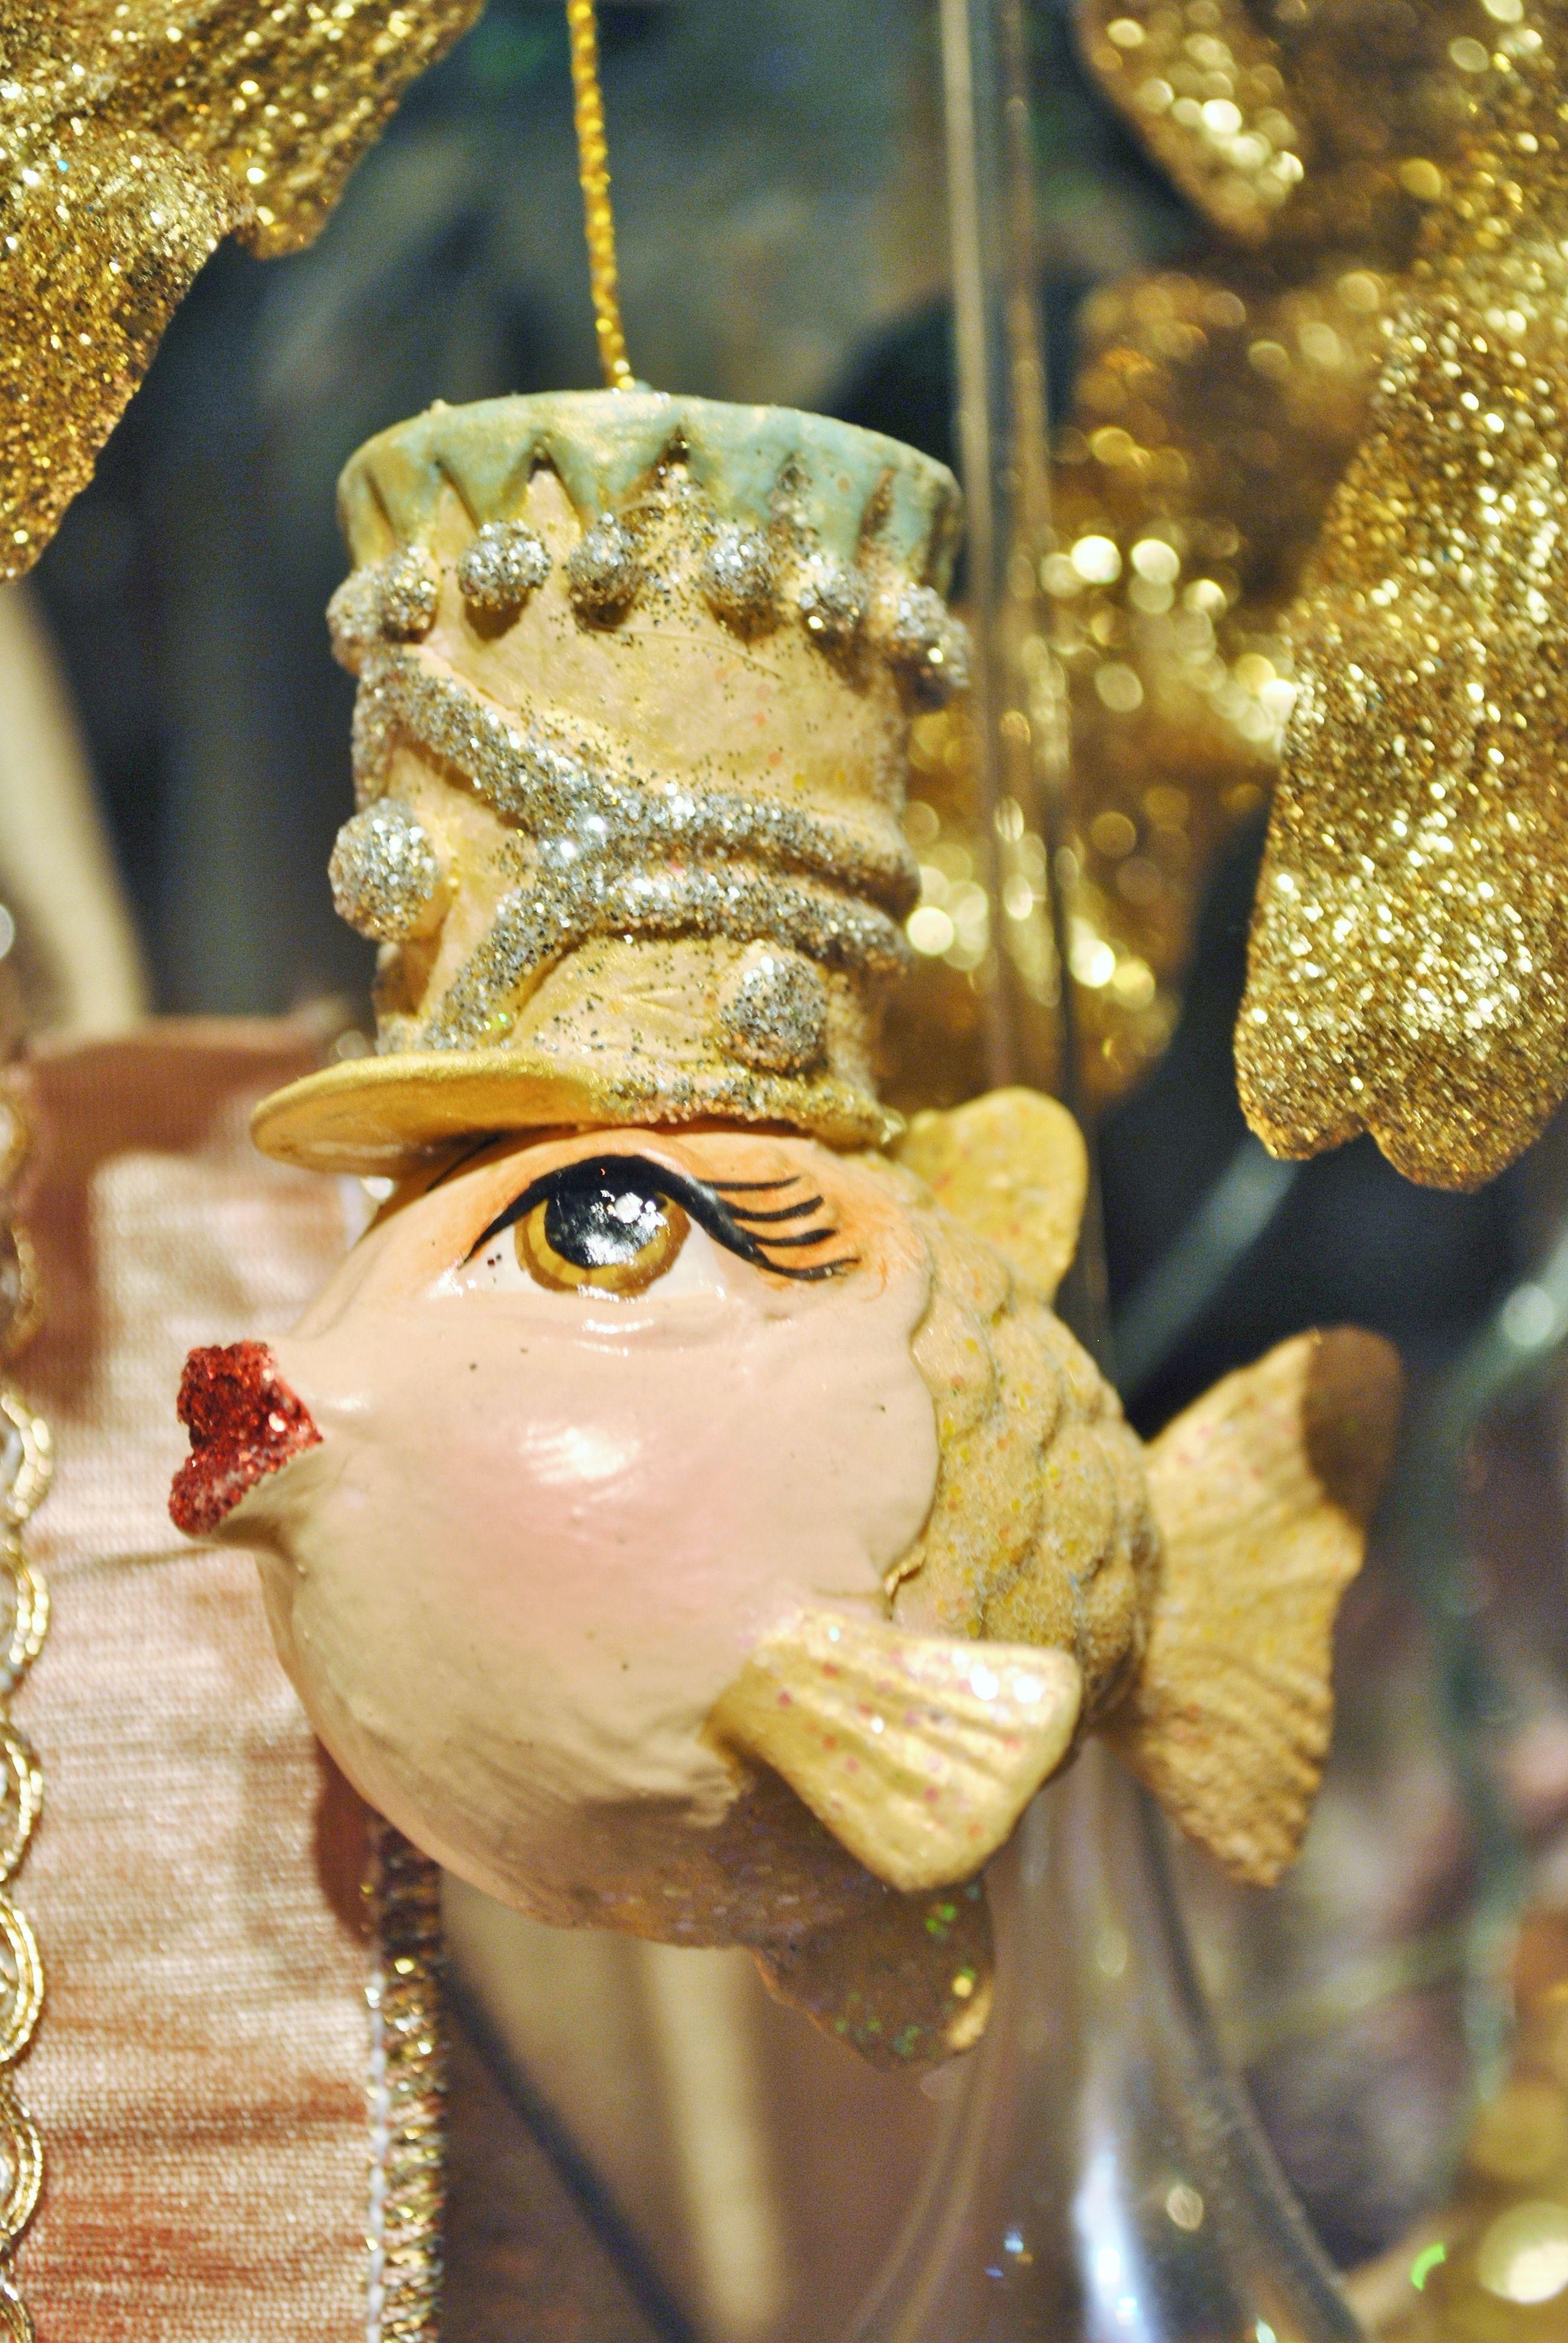 ballerina collection by goodwill belgium fish ornament beach